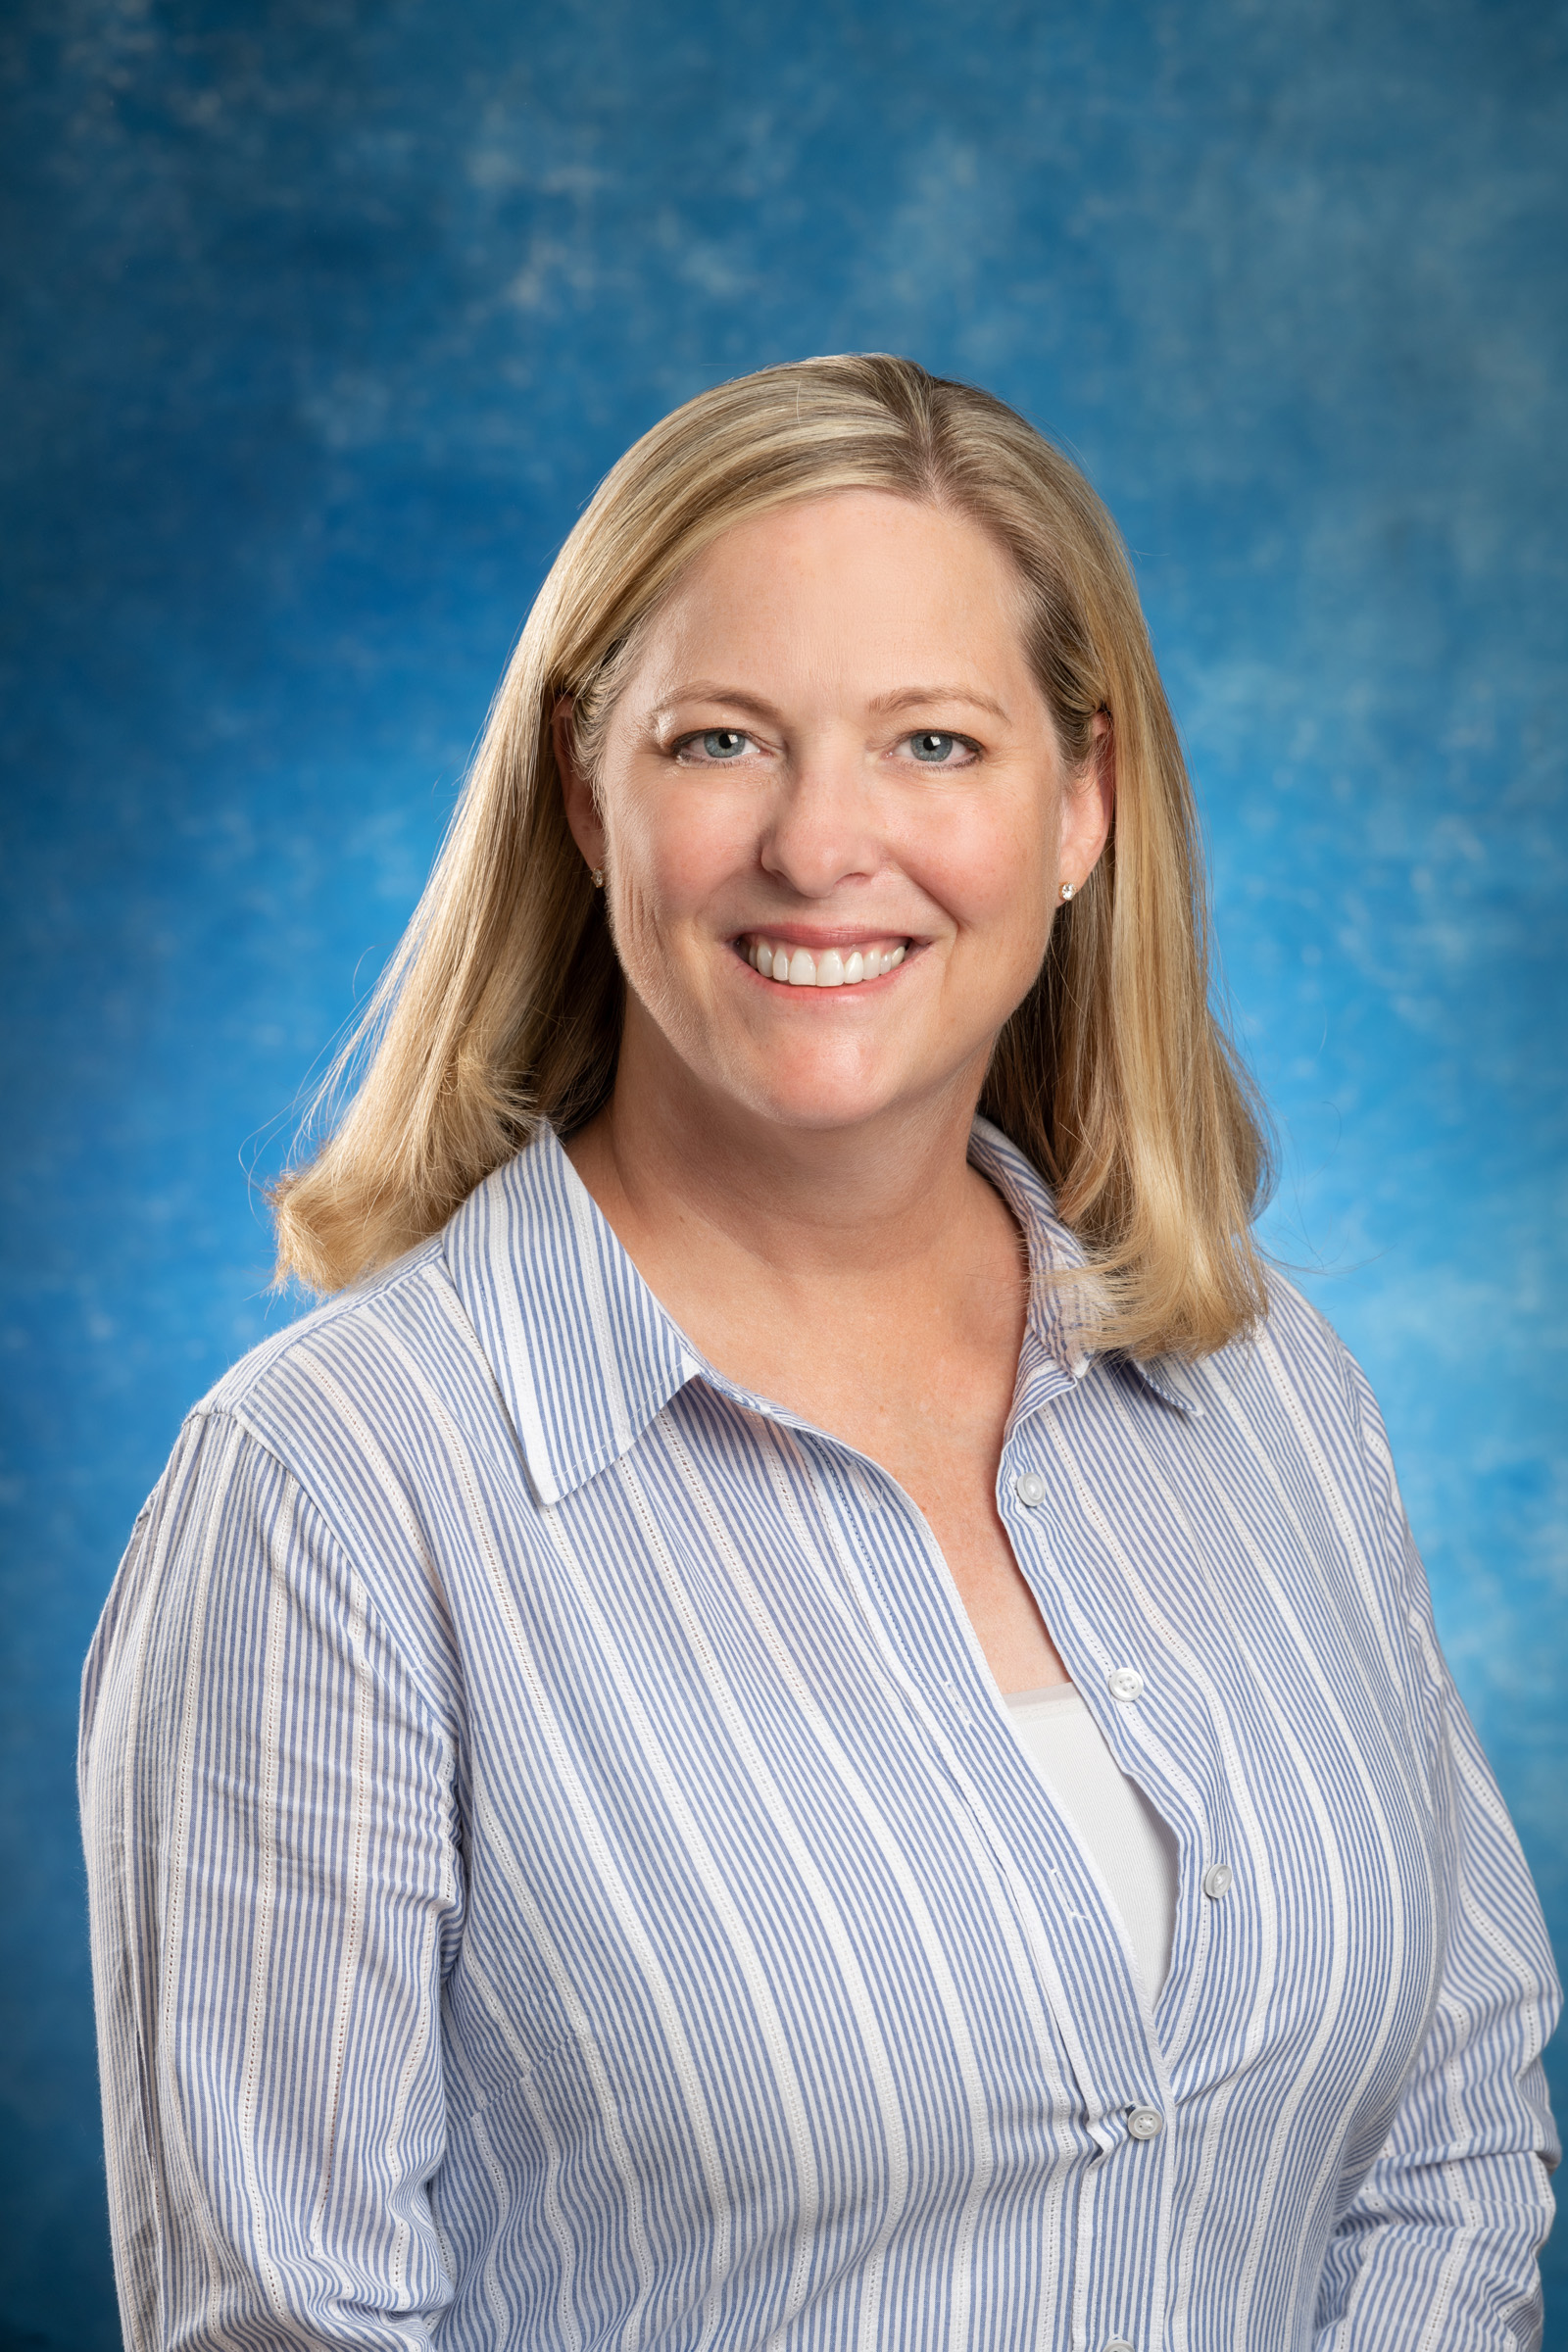 Susan Czelusta, CNM - Associates of Women's Health Care of Pueblo, Colorado